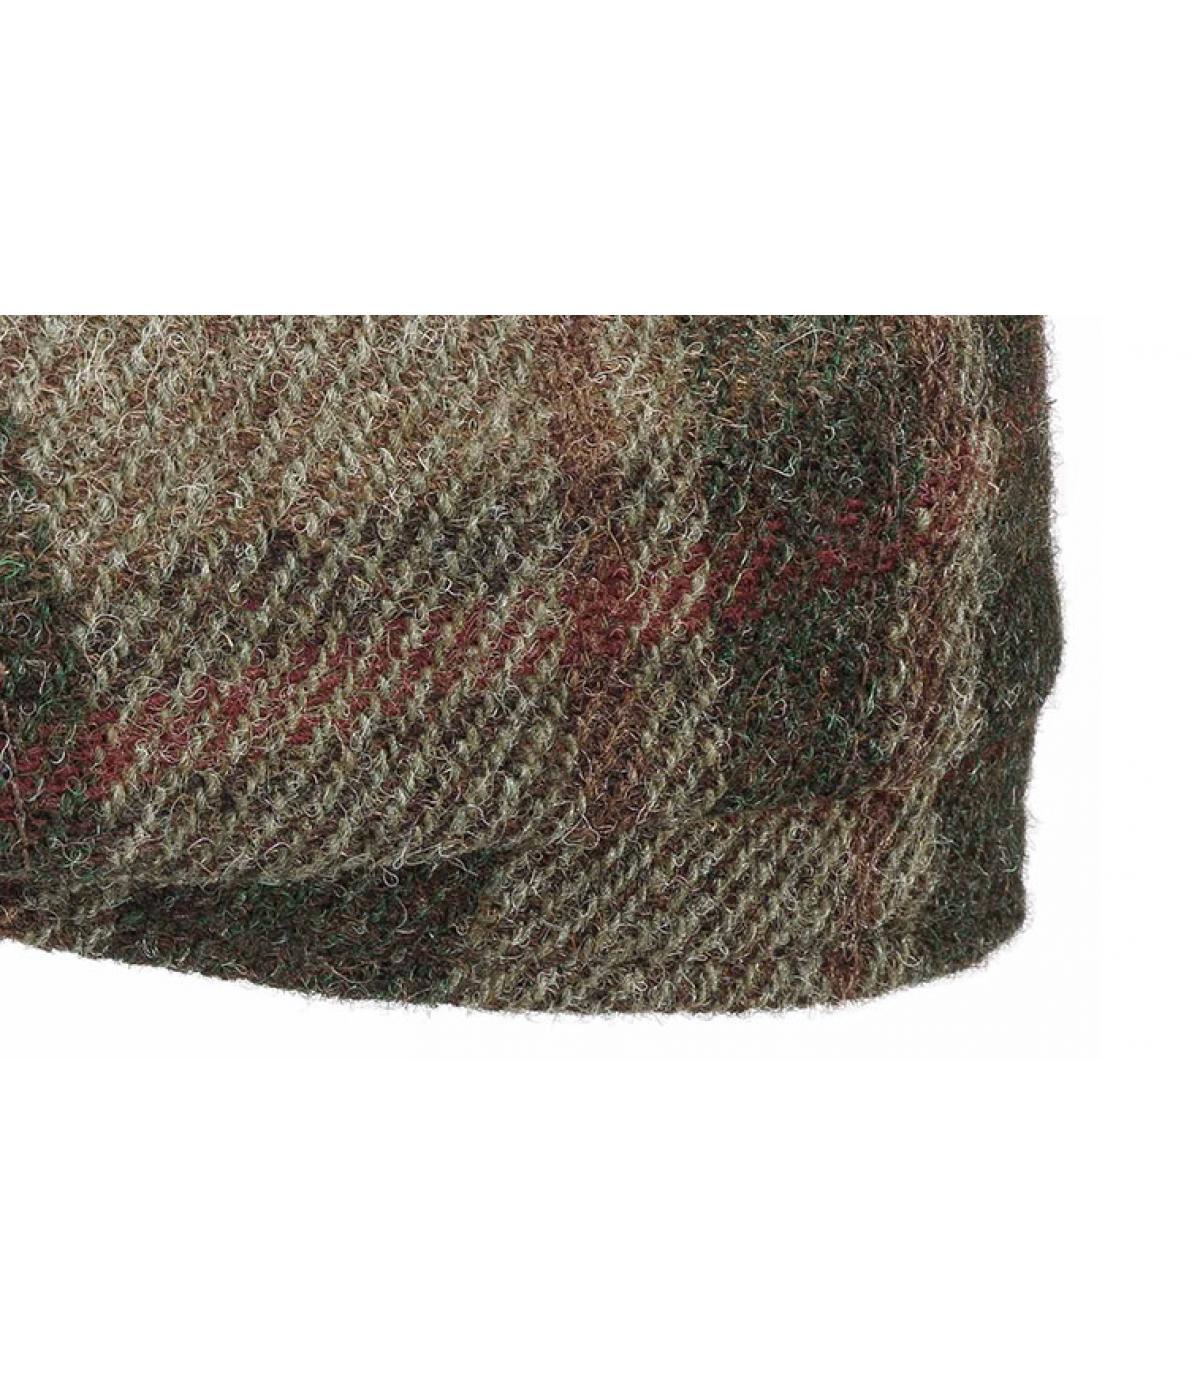 Dettagli Hatteras Virgin Wool check beige olive - image 3